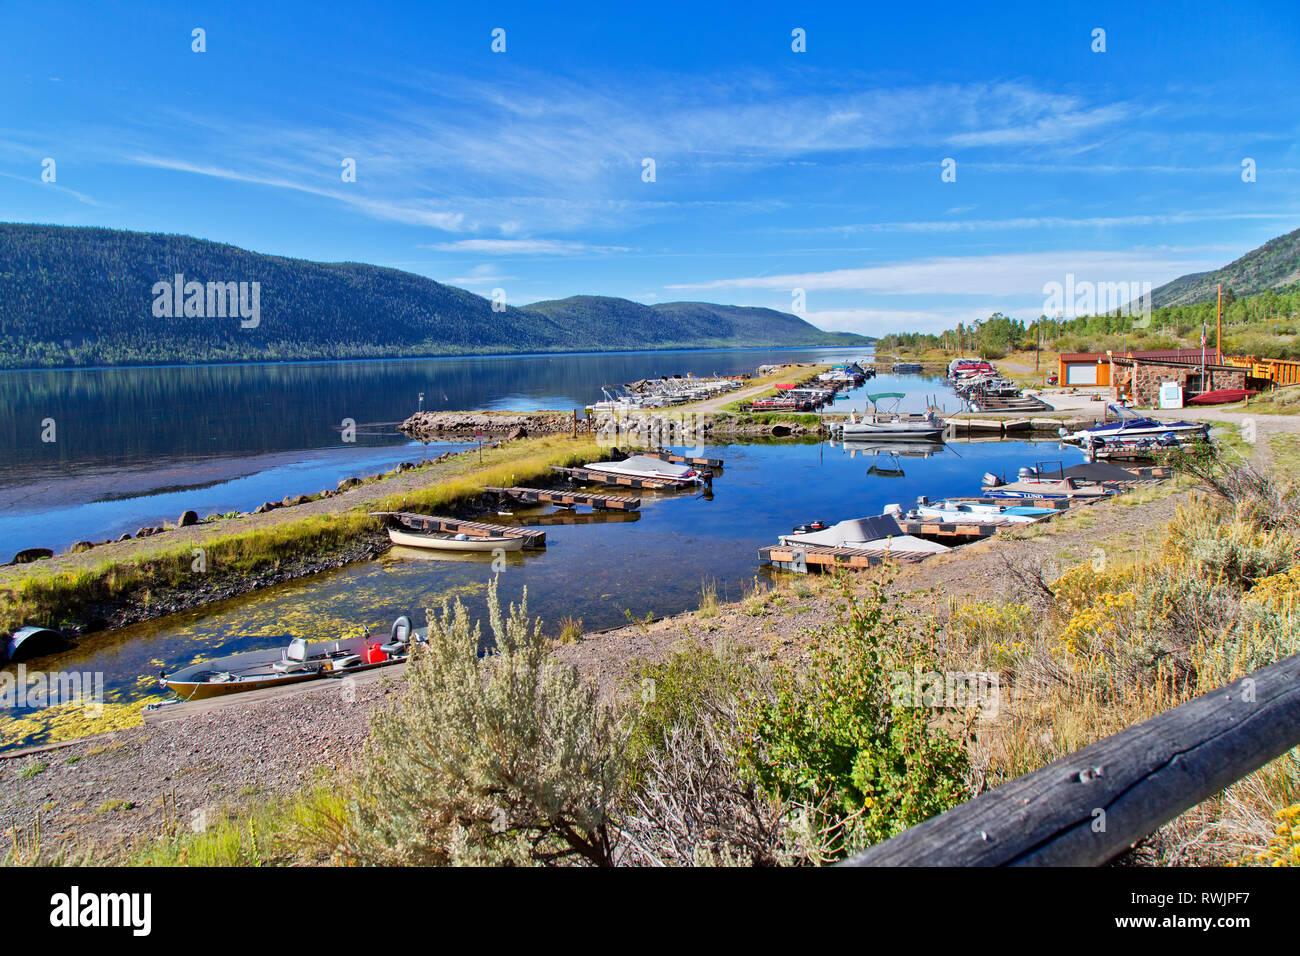 Bowery Haven Marina & RV Resort, Fish Lake,  Aspen forest, Pando Clone, Fishlake National Forest, Wasatch Mountains. - Stock Image